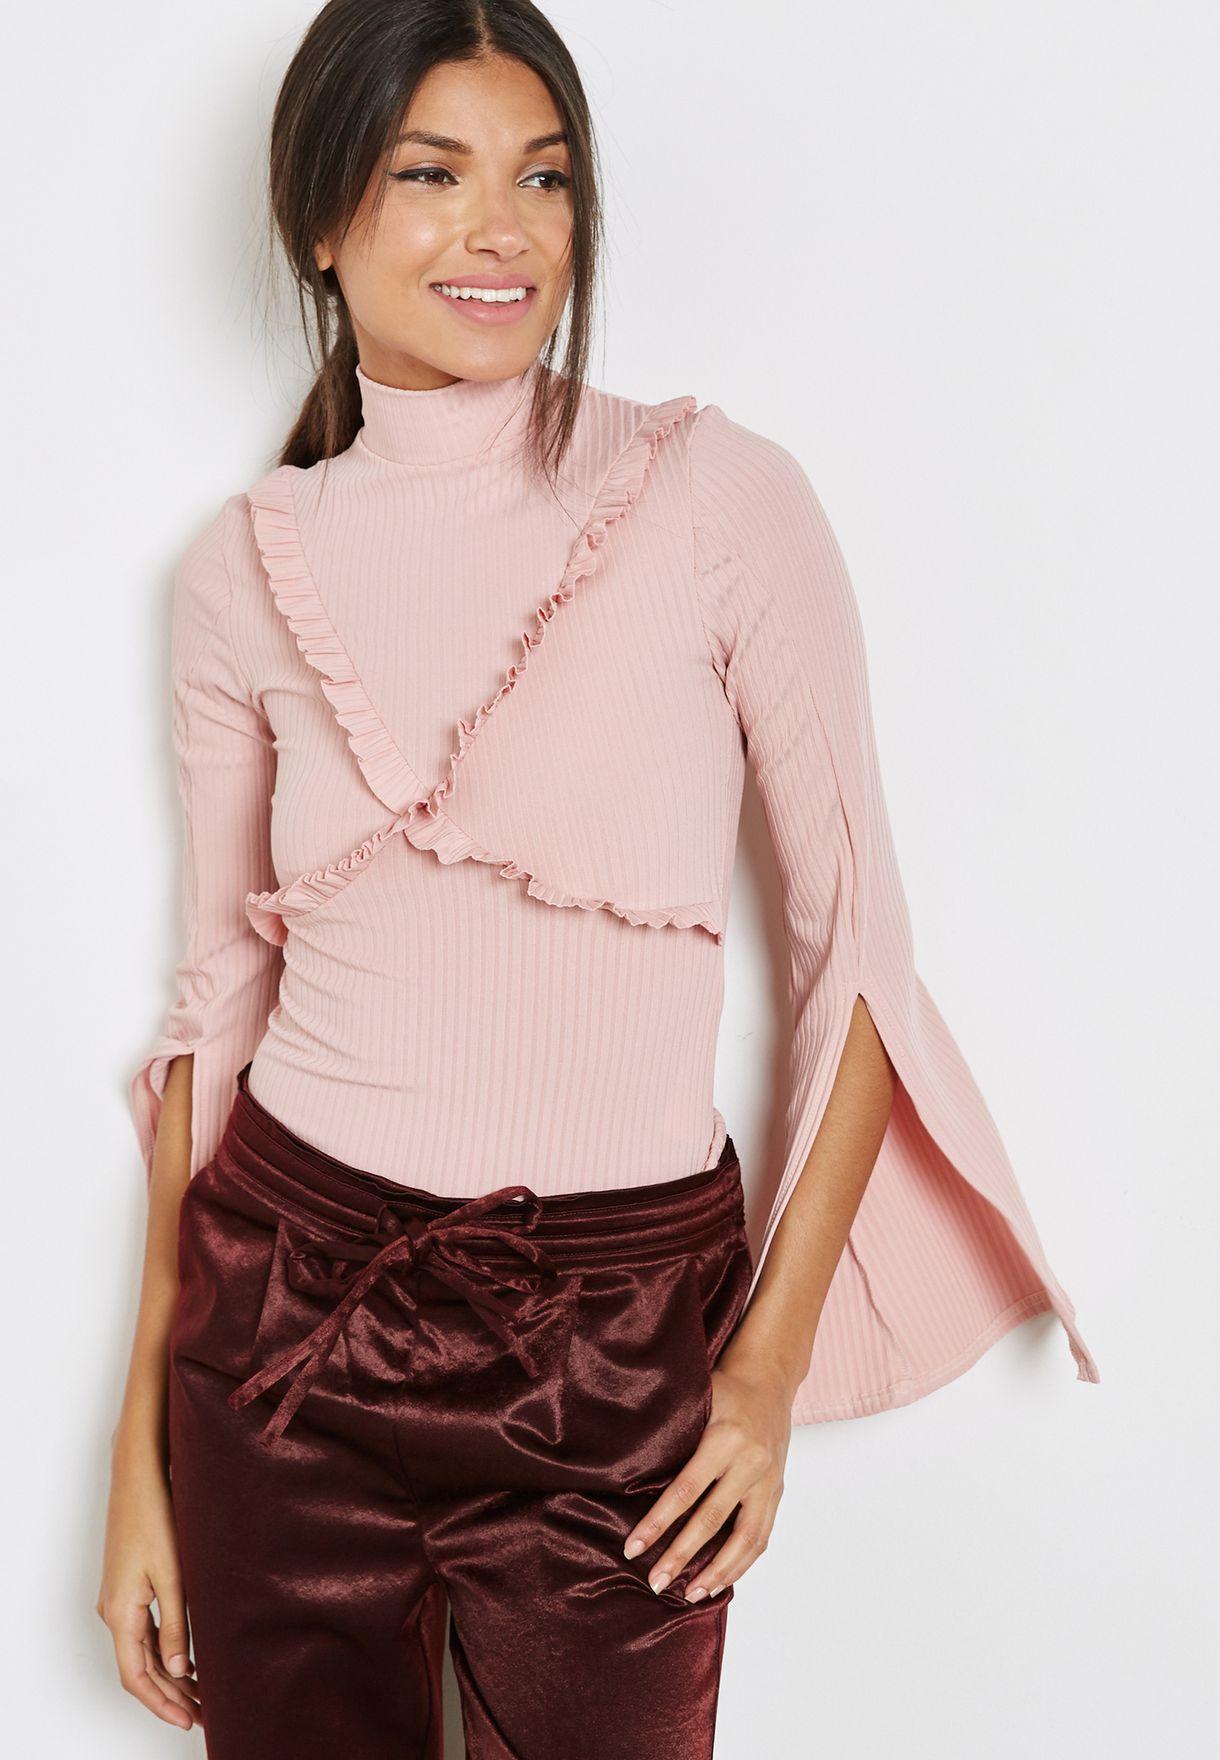 7bdc6f605 Shop Lost Ink pink High Neck Split Sleeve Top 0601113131060065 for ...